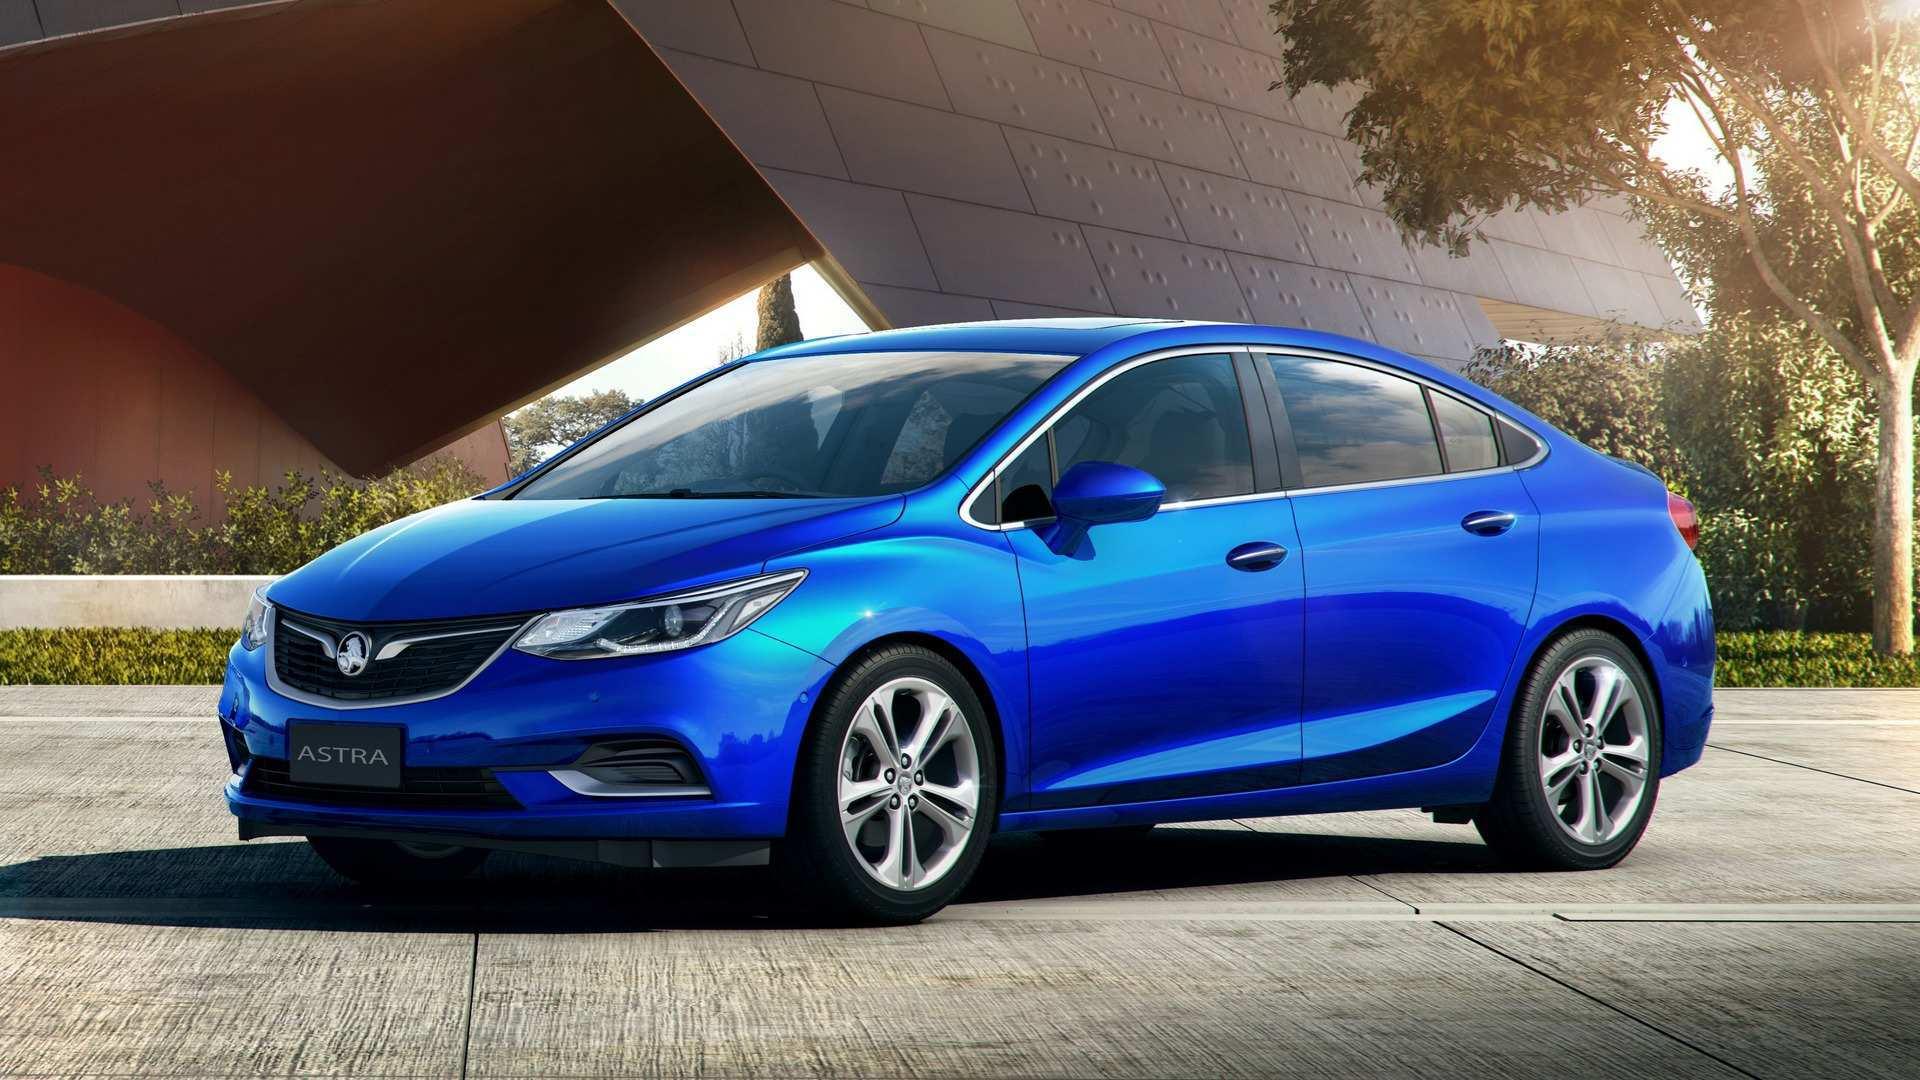 91 All New Opel Astra Sedan 2020 New Concept with Opel Astra Sedan 2020